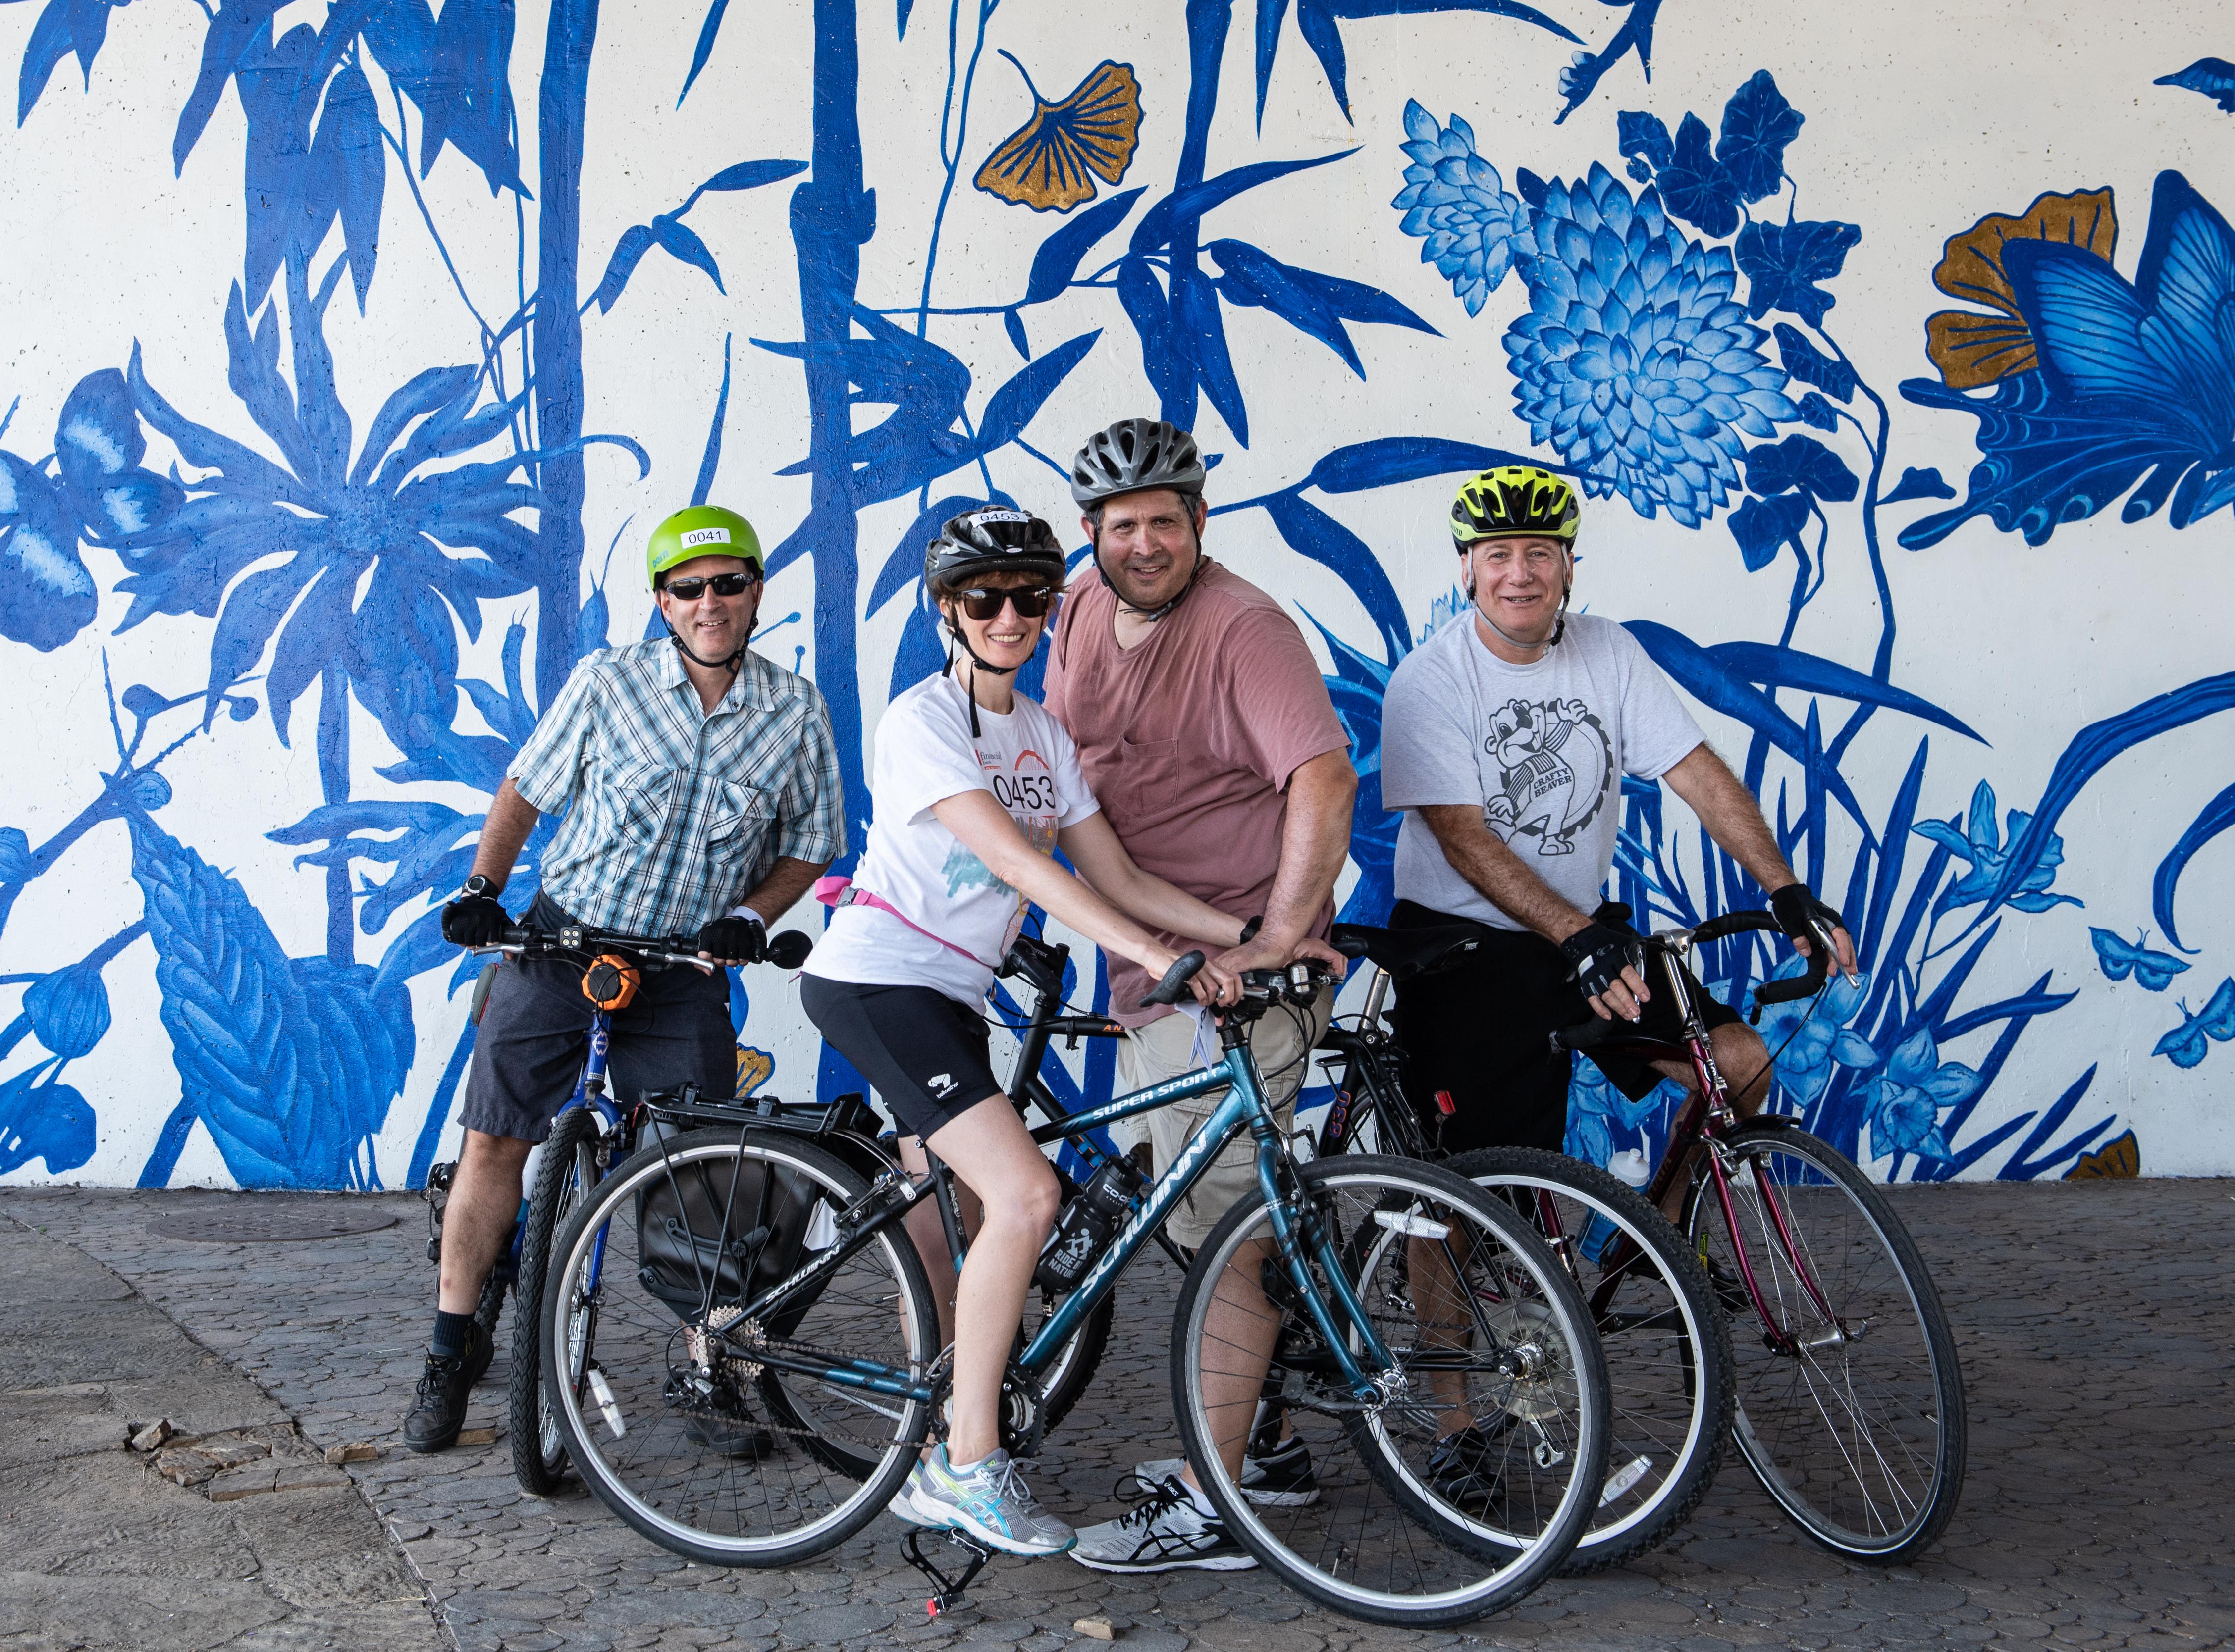 Community Service Organization - Volunteer for Boulevard Lakefront Tour bike ride!  1